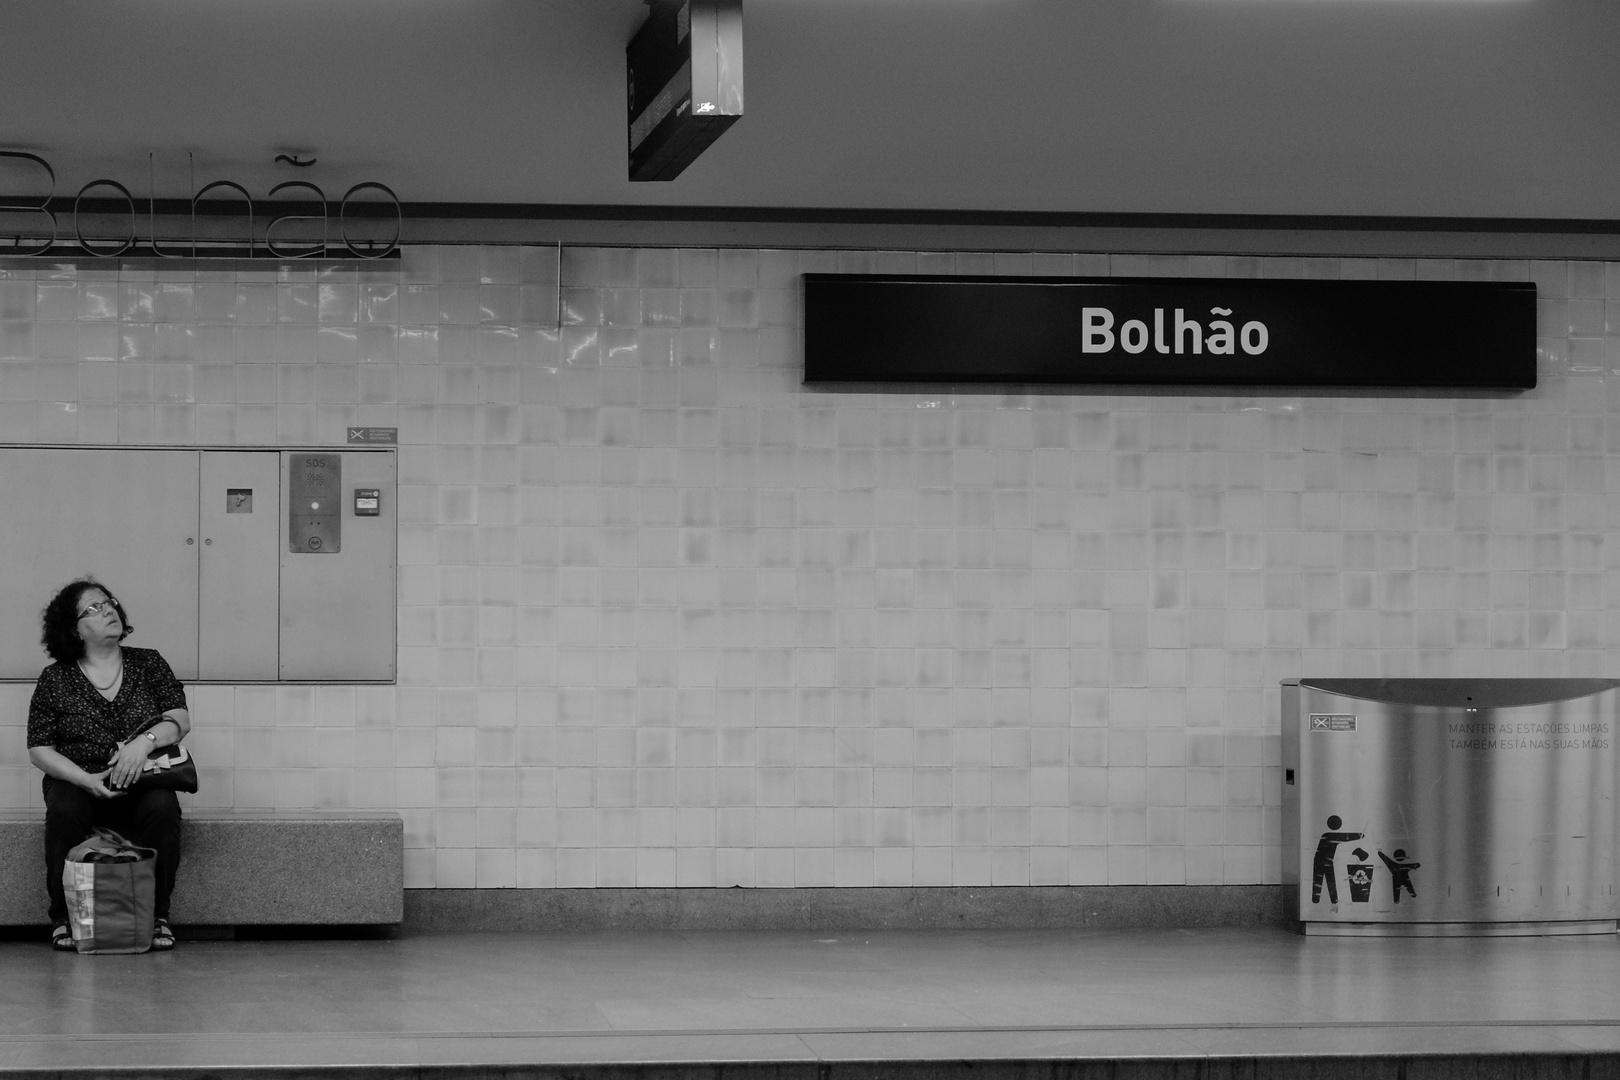 Wann kommt die nächste Bahn.....?